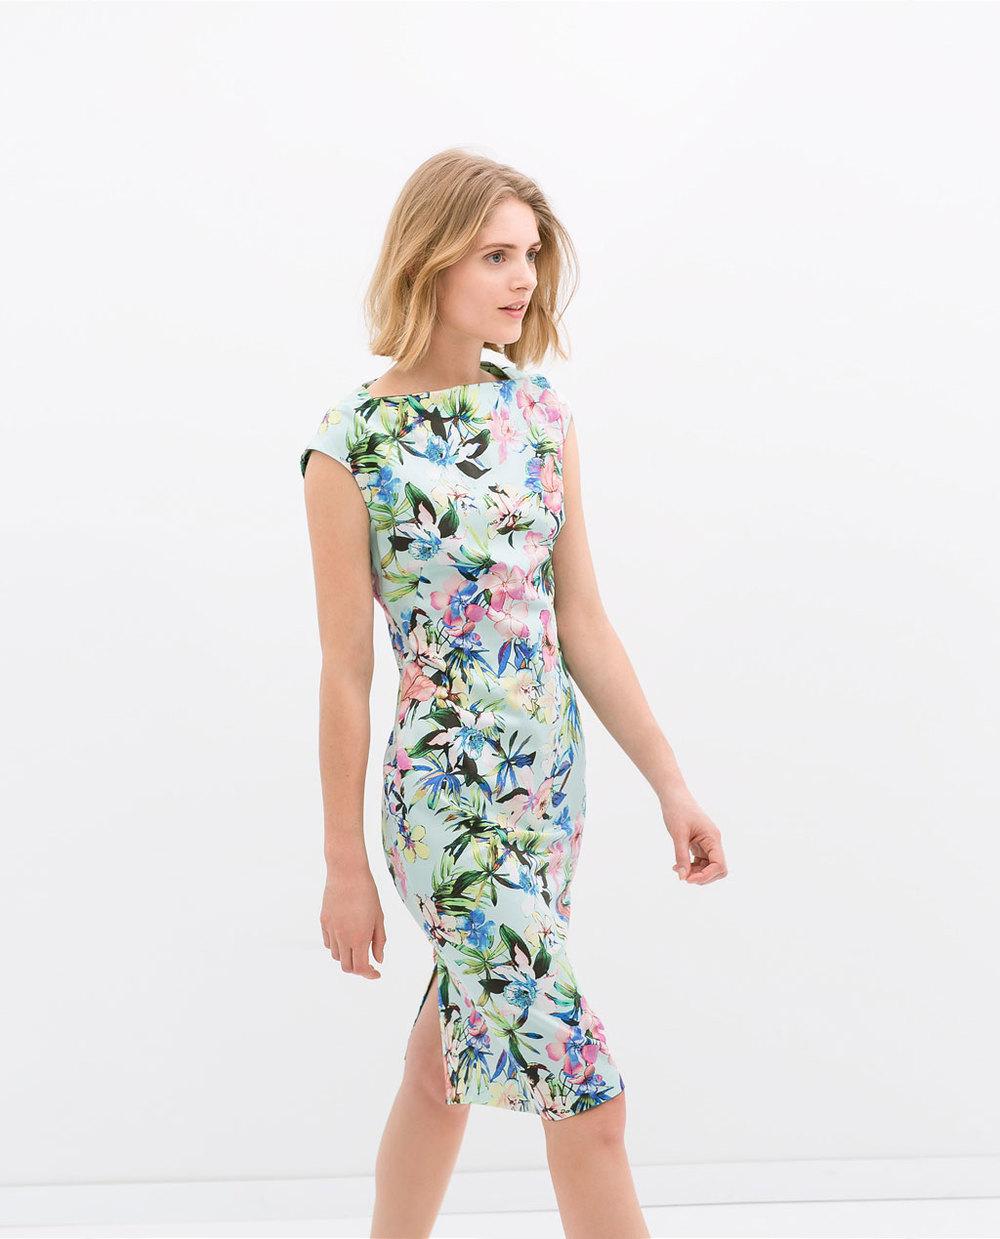 Zara Boatneck Printed Dress